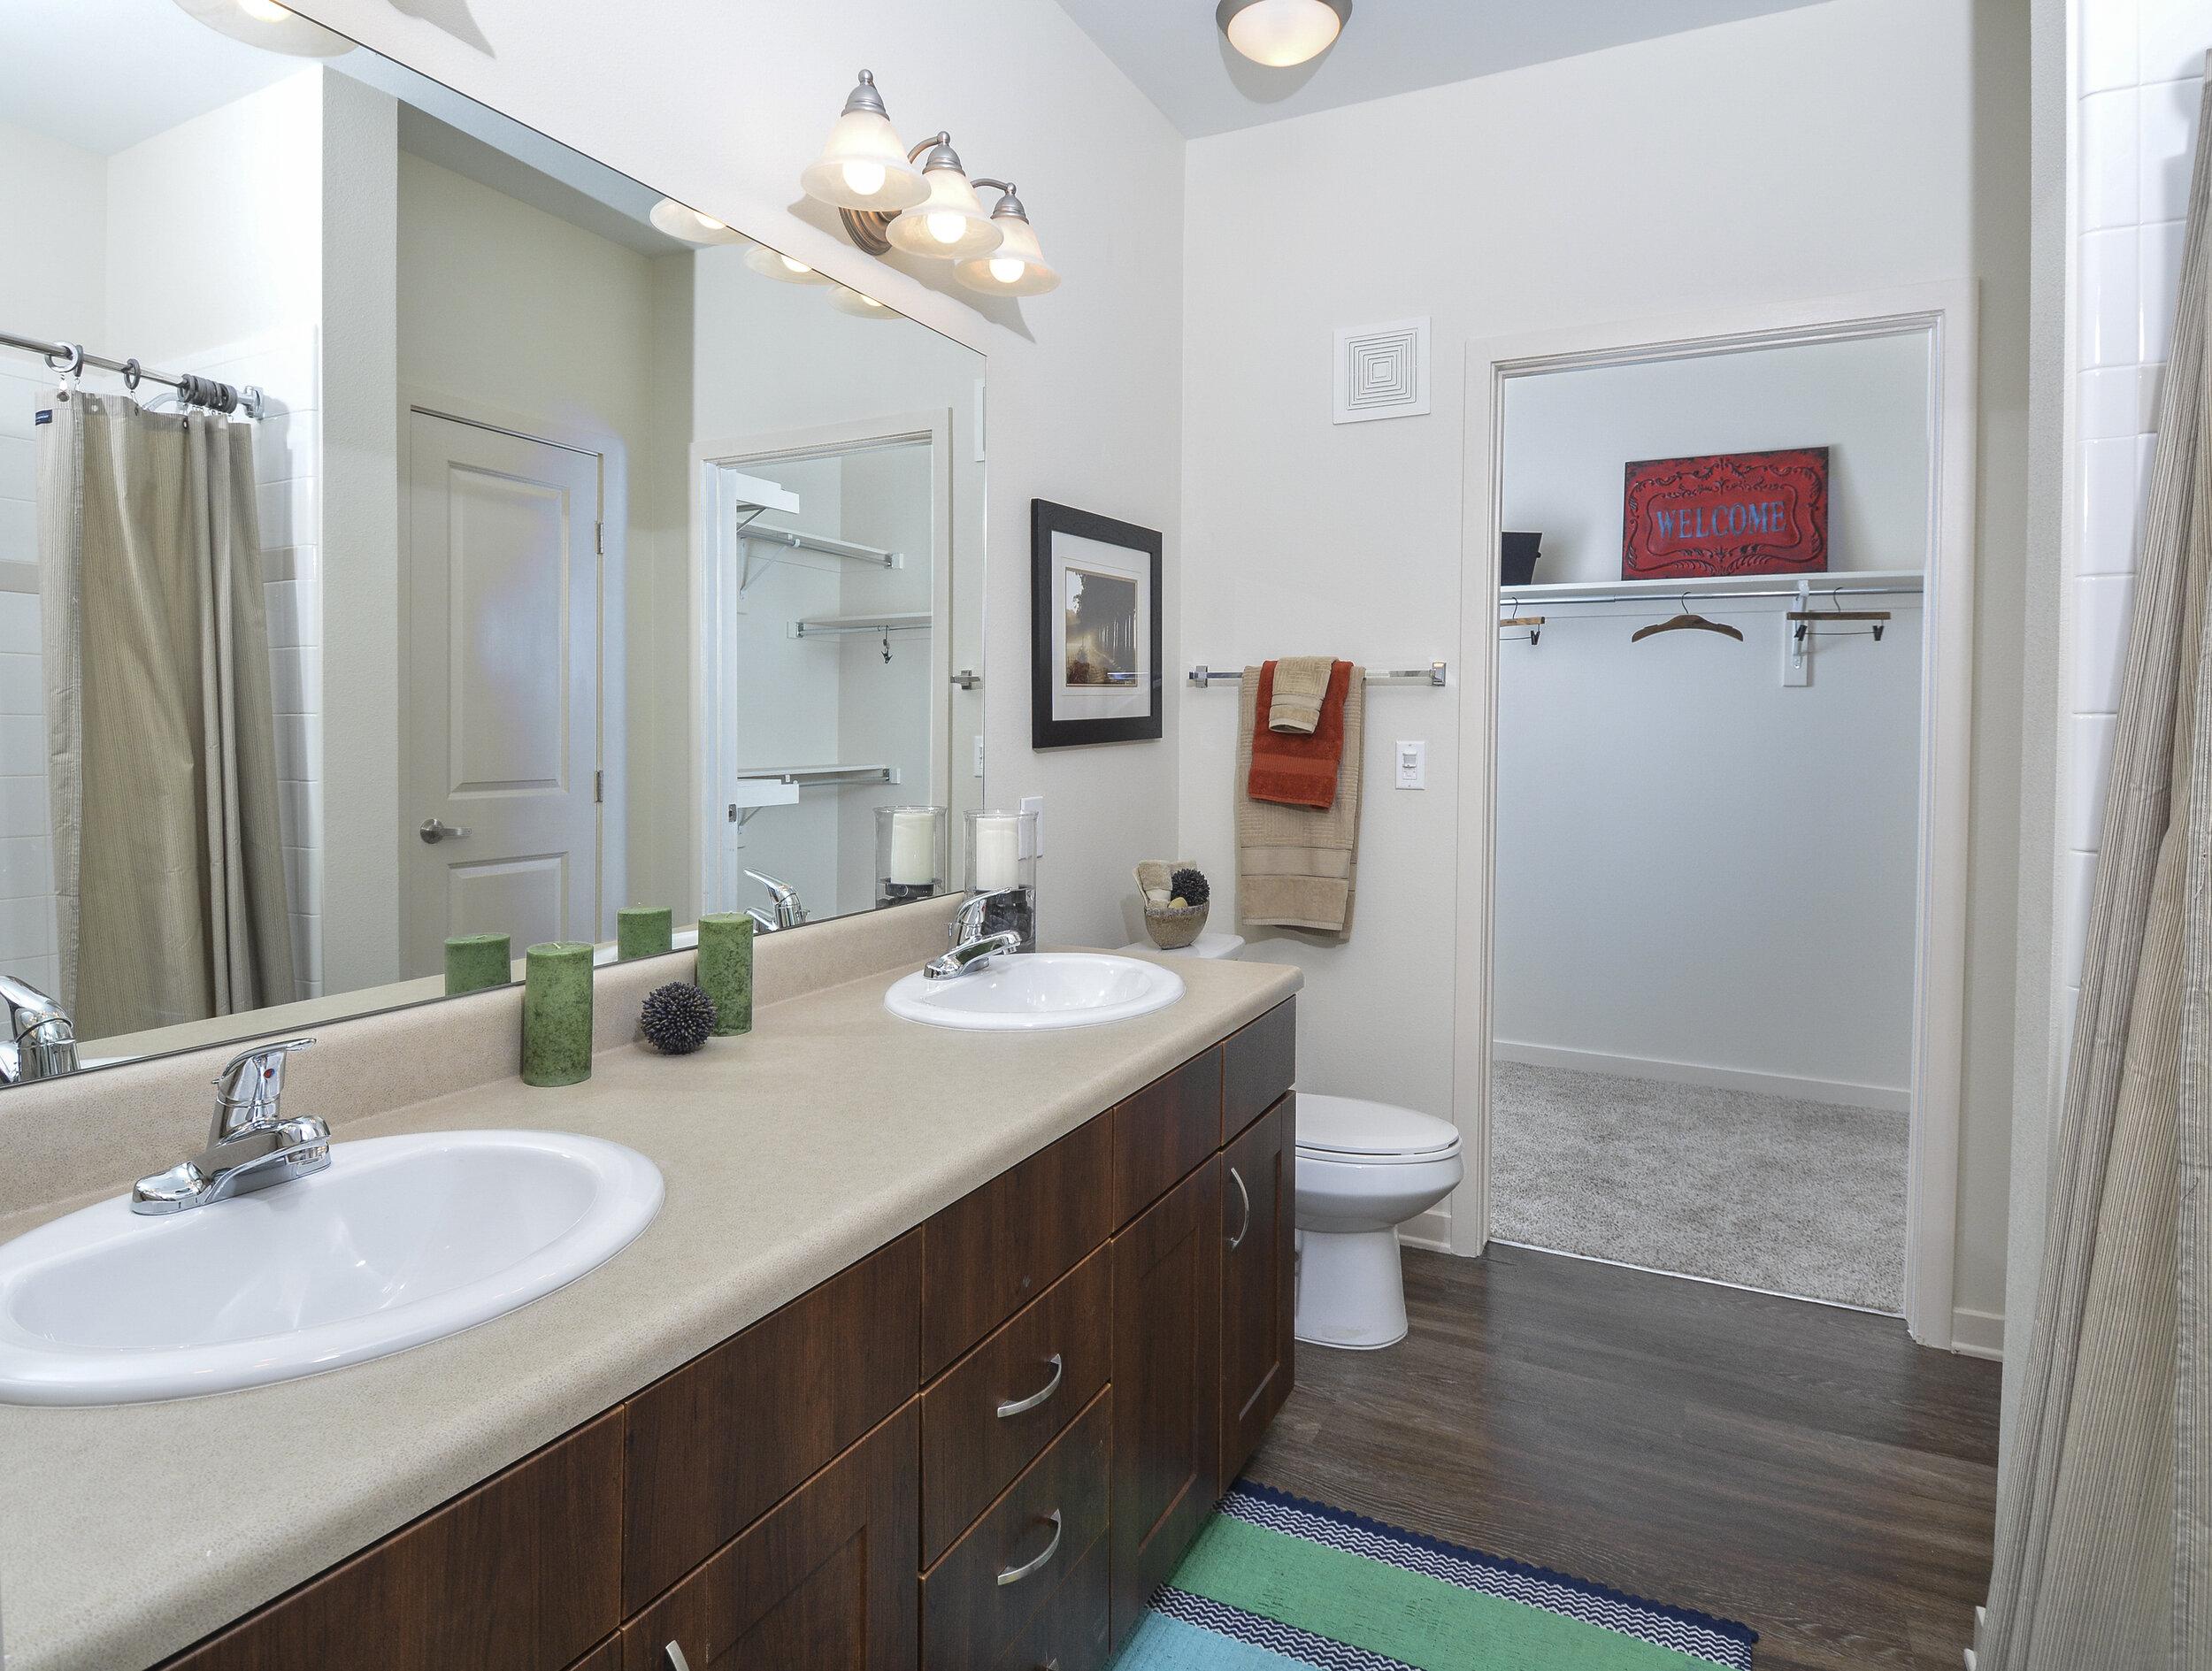 08 Stylish Bathrooms Feature Quartz Bath Countertops.jpg